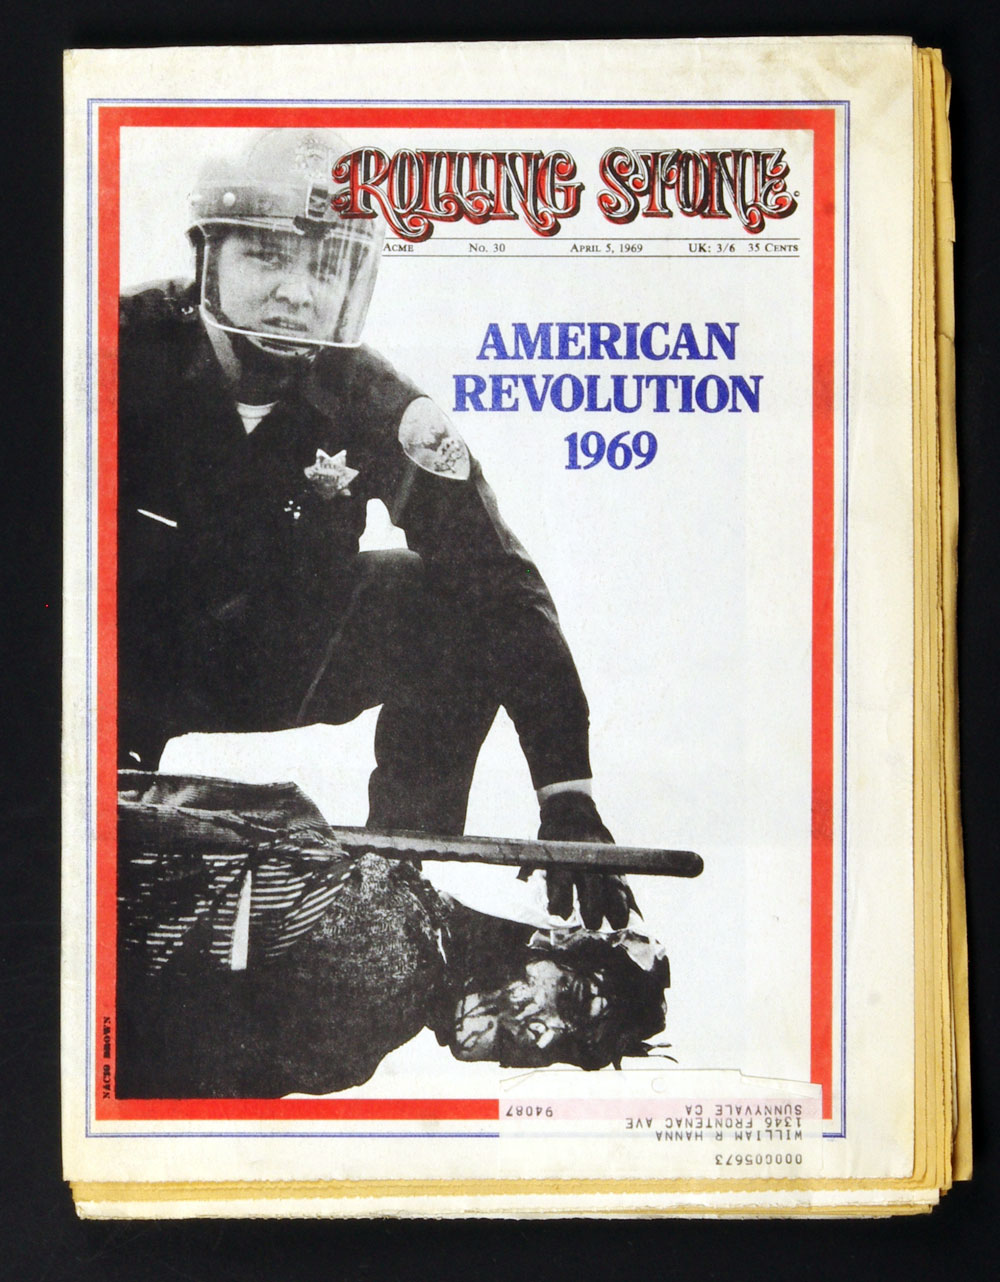 Rolling Stone Magazine 1969 Apr 5 No. 30 American Revolution